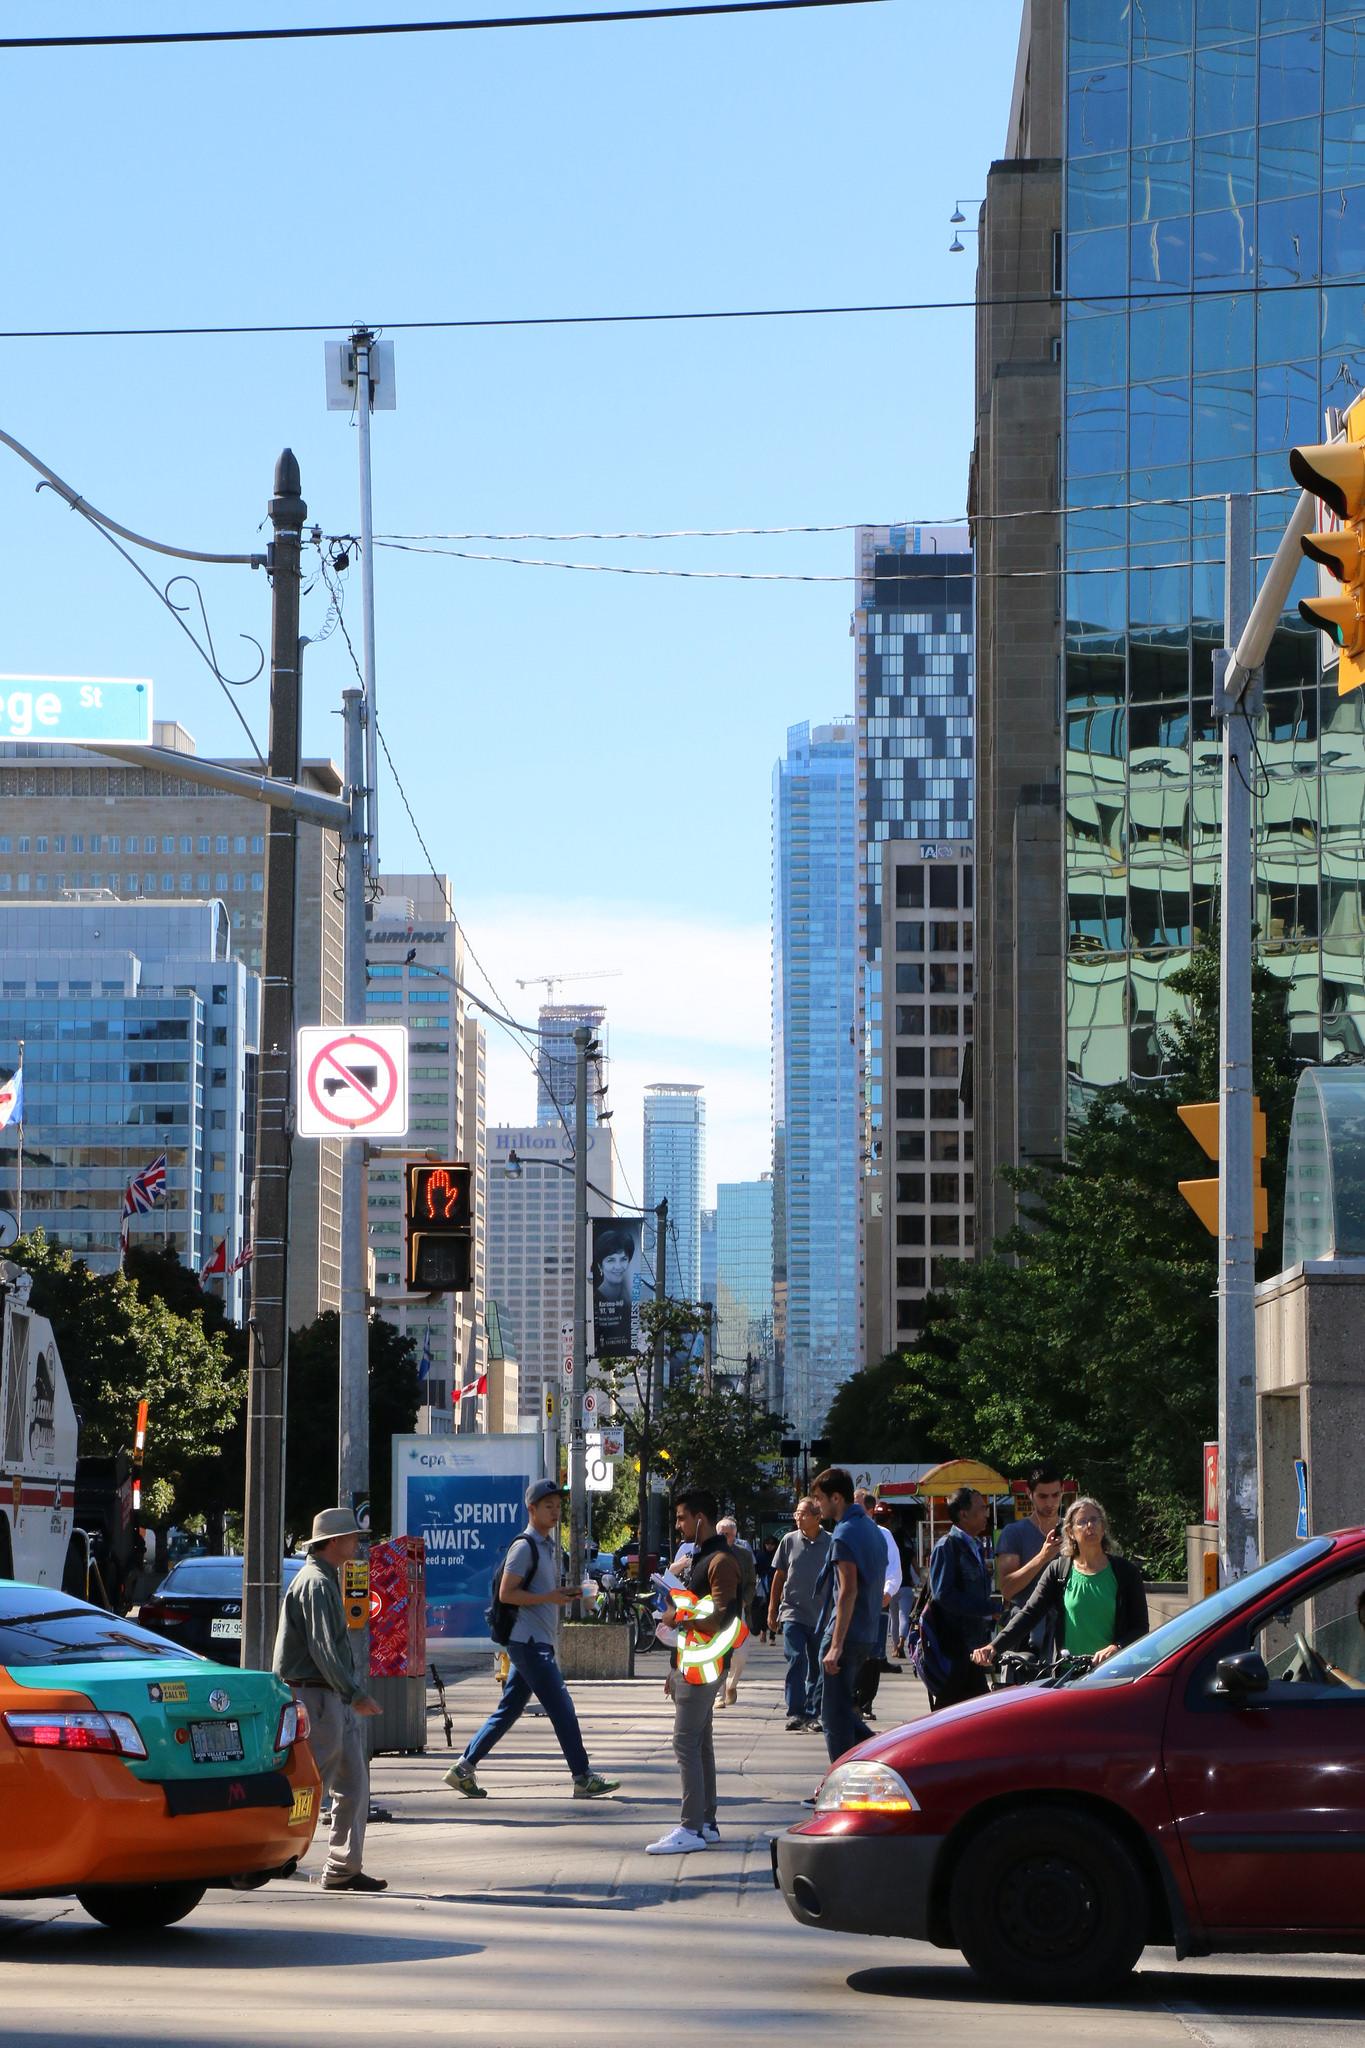 Toronto_23453765829_l.jpg